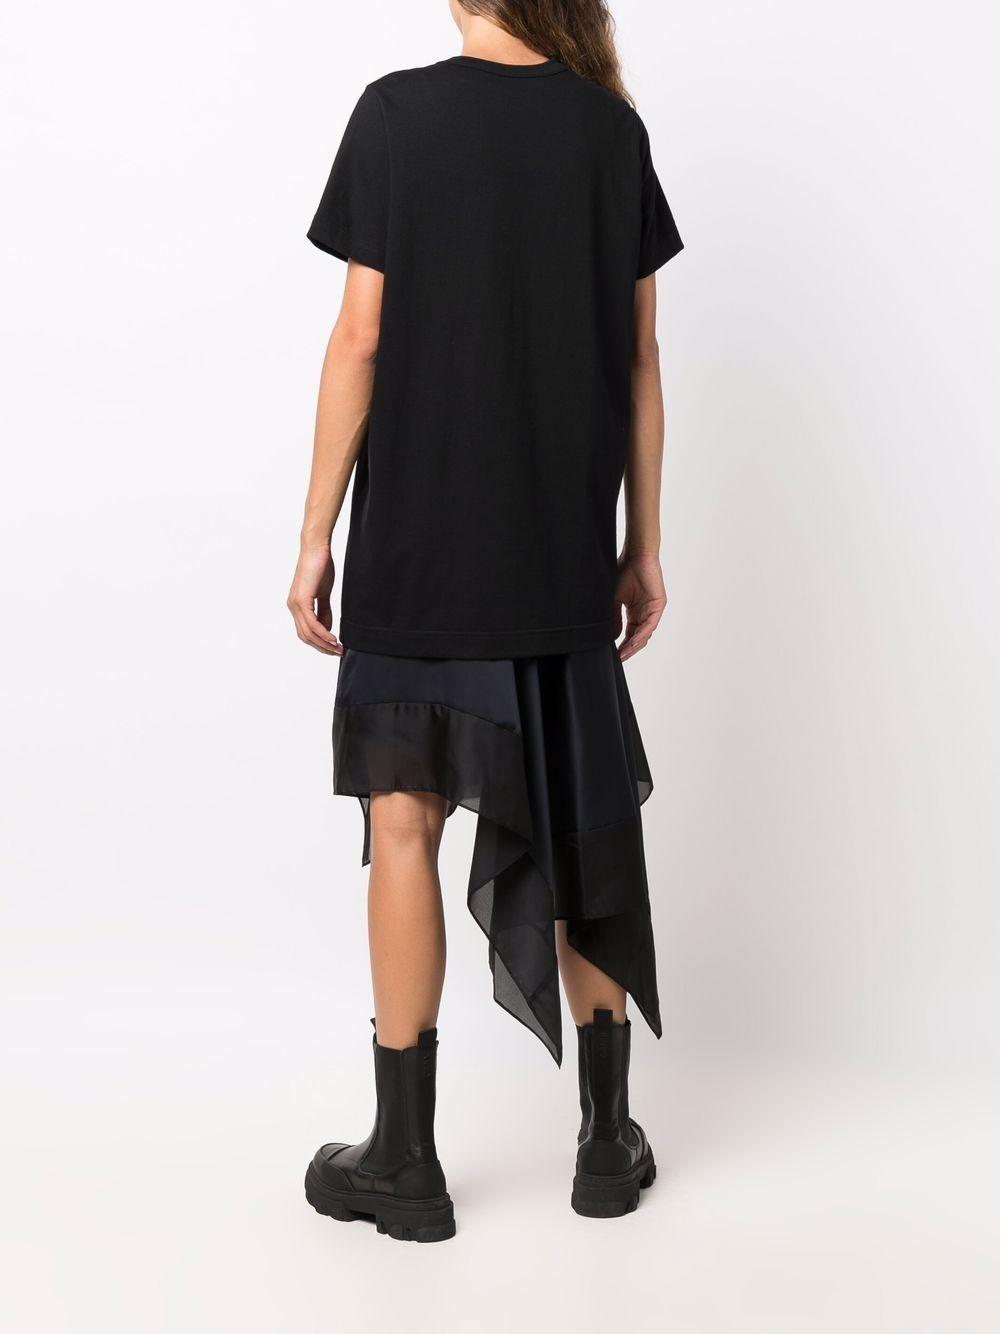 SACAI | Dress | 21-05833005